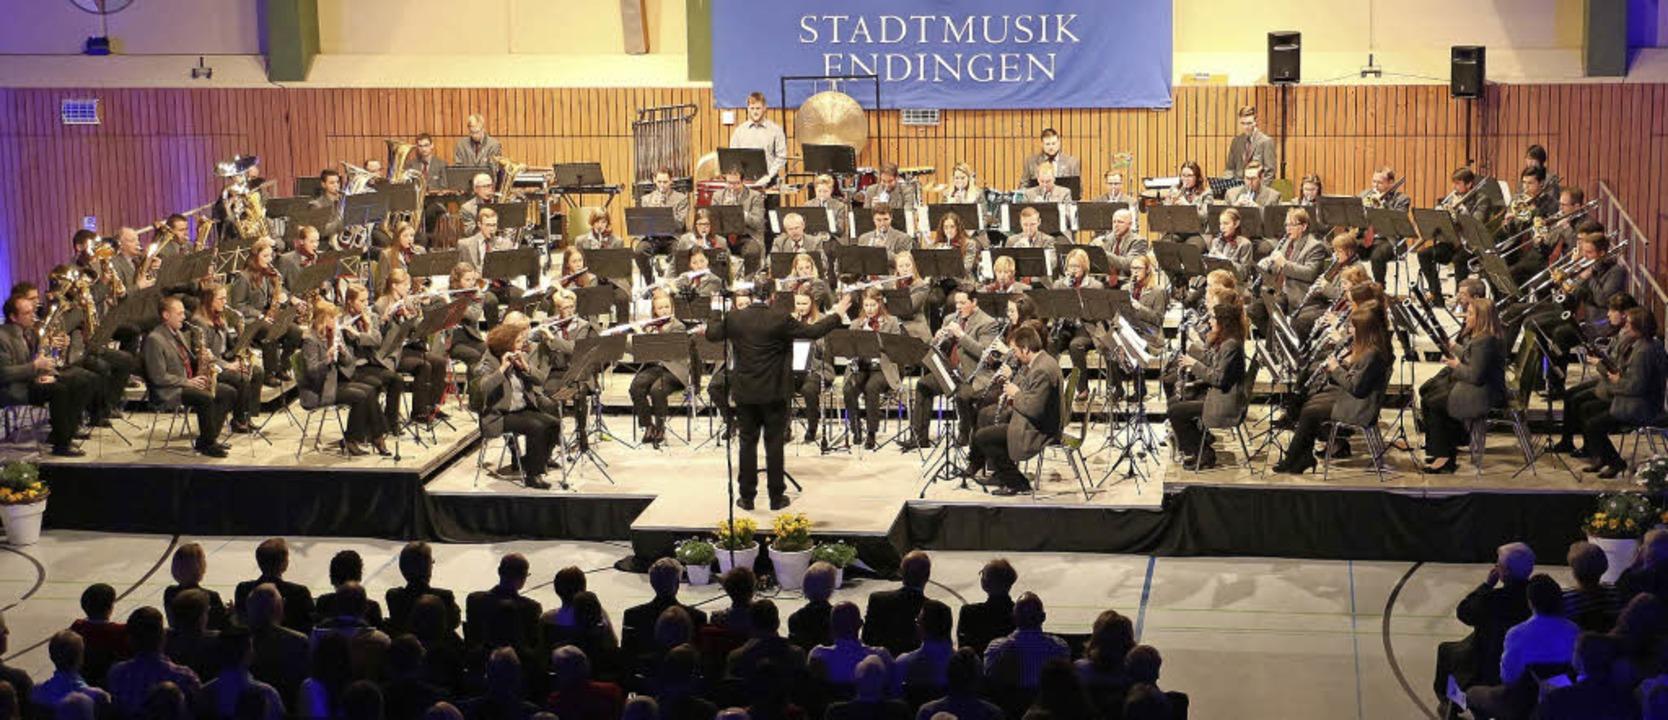 Jahreskonzert 2018 der Stadtmusik Endi... Stadtmusikdirektor Martin Baumgartner  | Foto: Martin Wendel